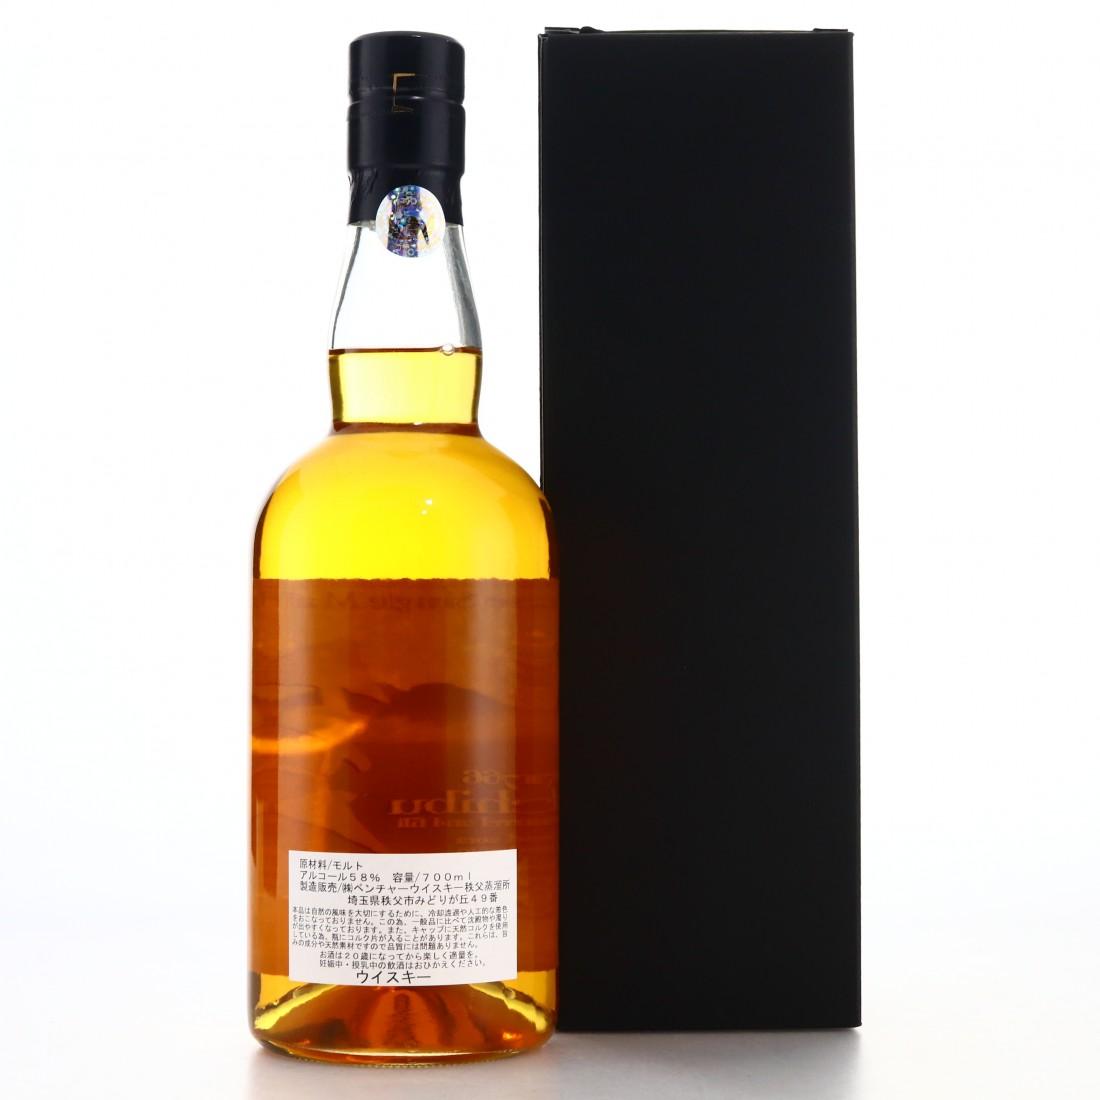 Chichibu 2012 Single Bourbon Cask 6 Year Old #1766 / Mitsukoshi Isetan